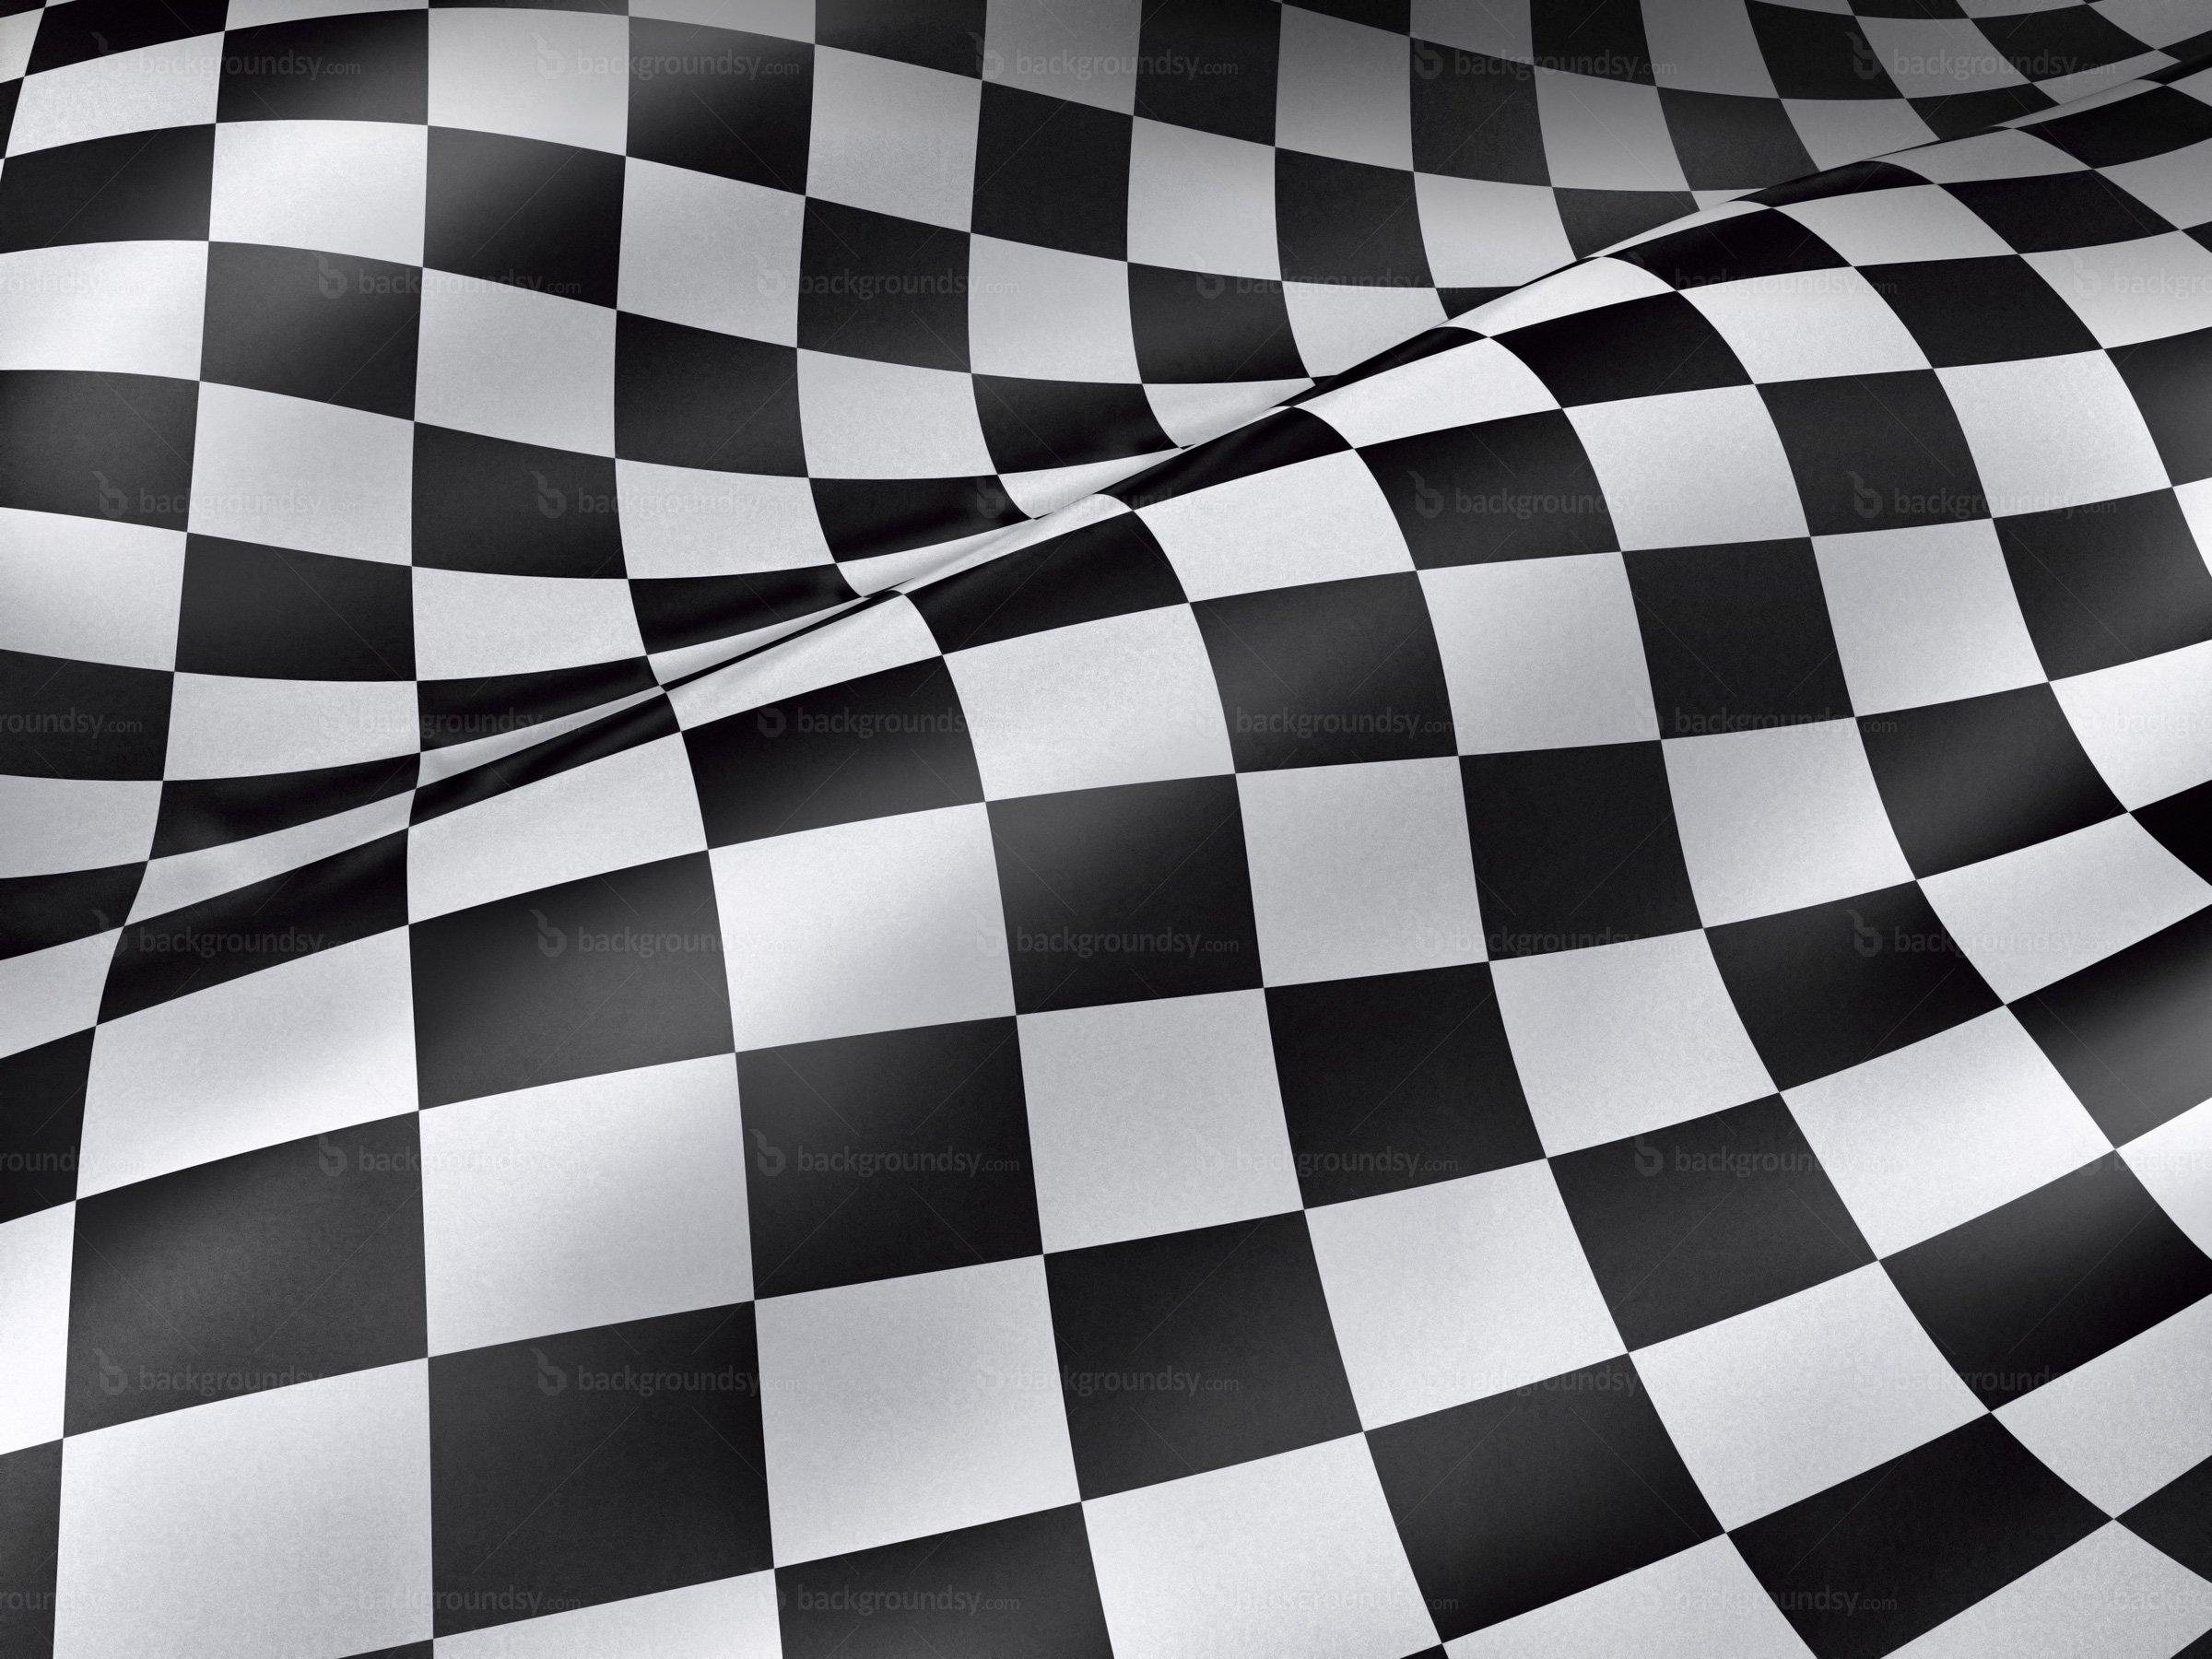 checkered flag wallpaper wallpapersafari checkered flag clip art jpeg checkered flag clip art border